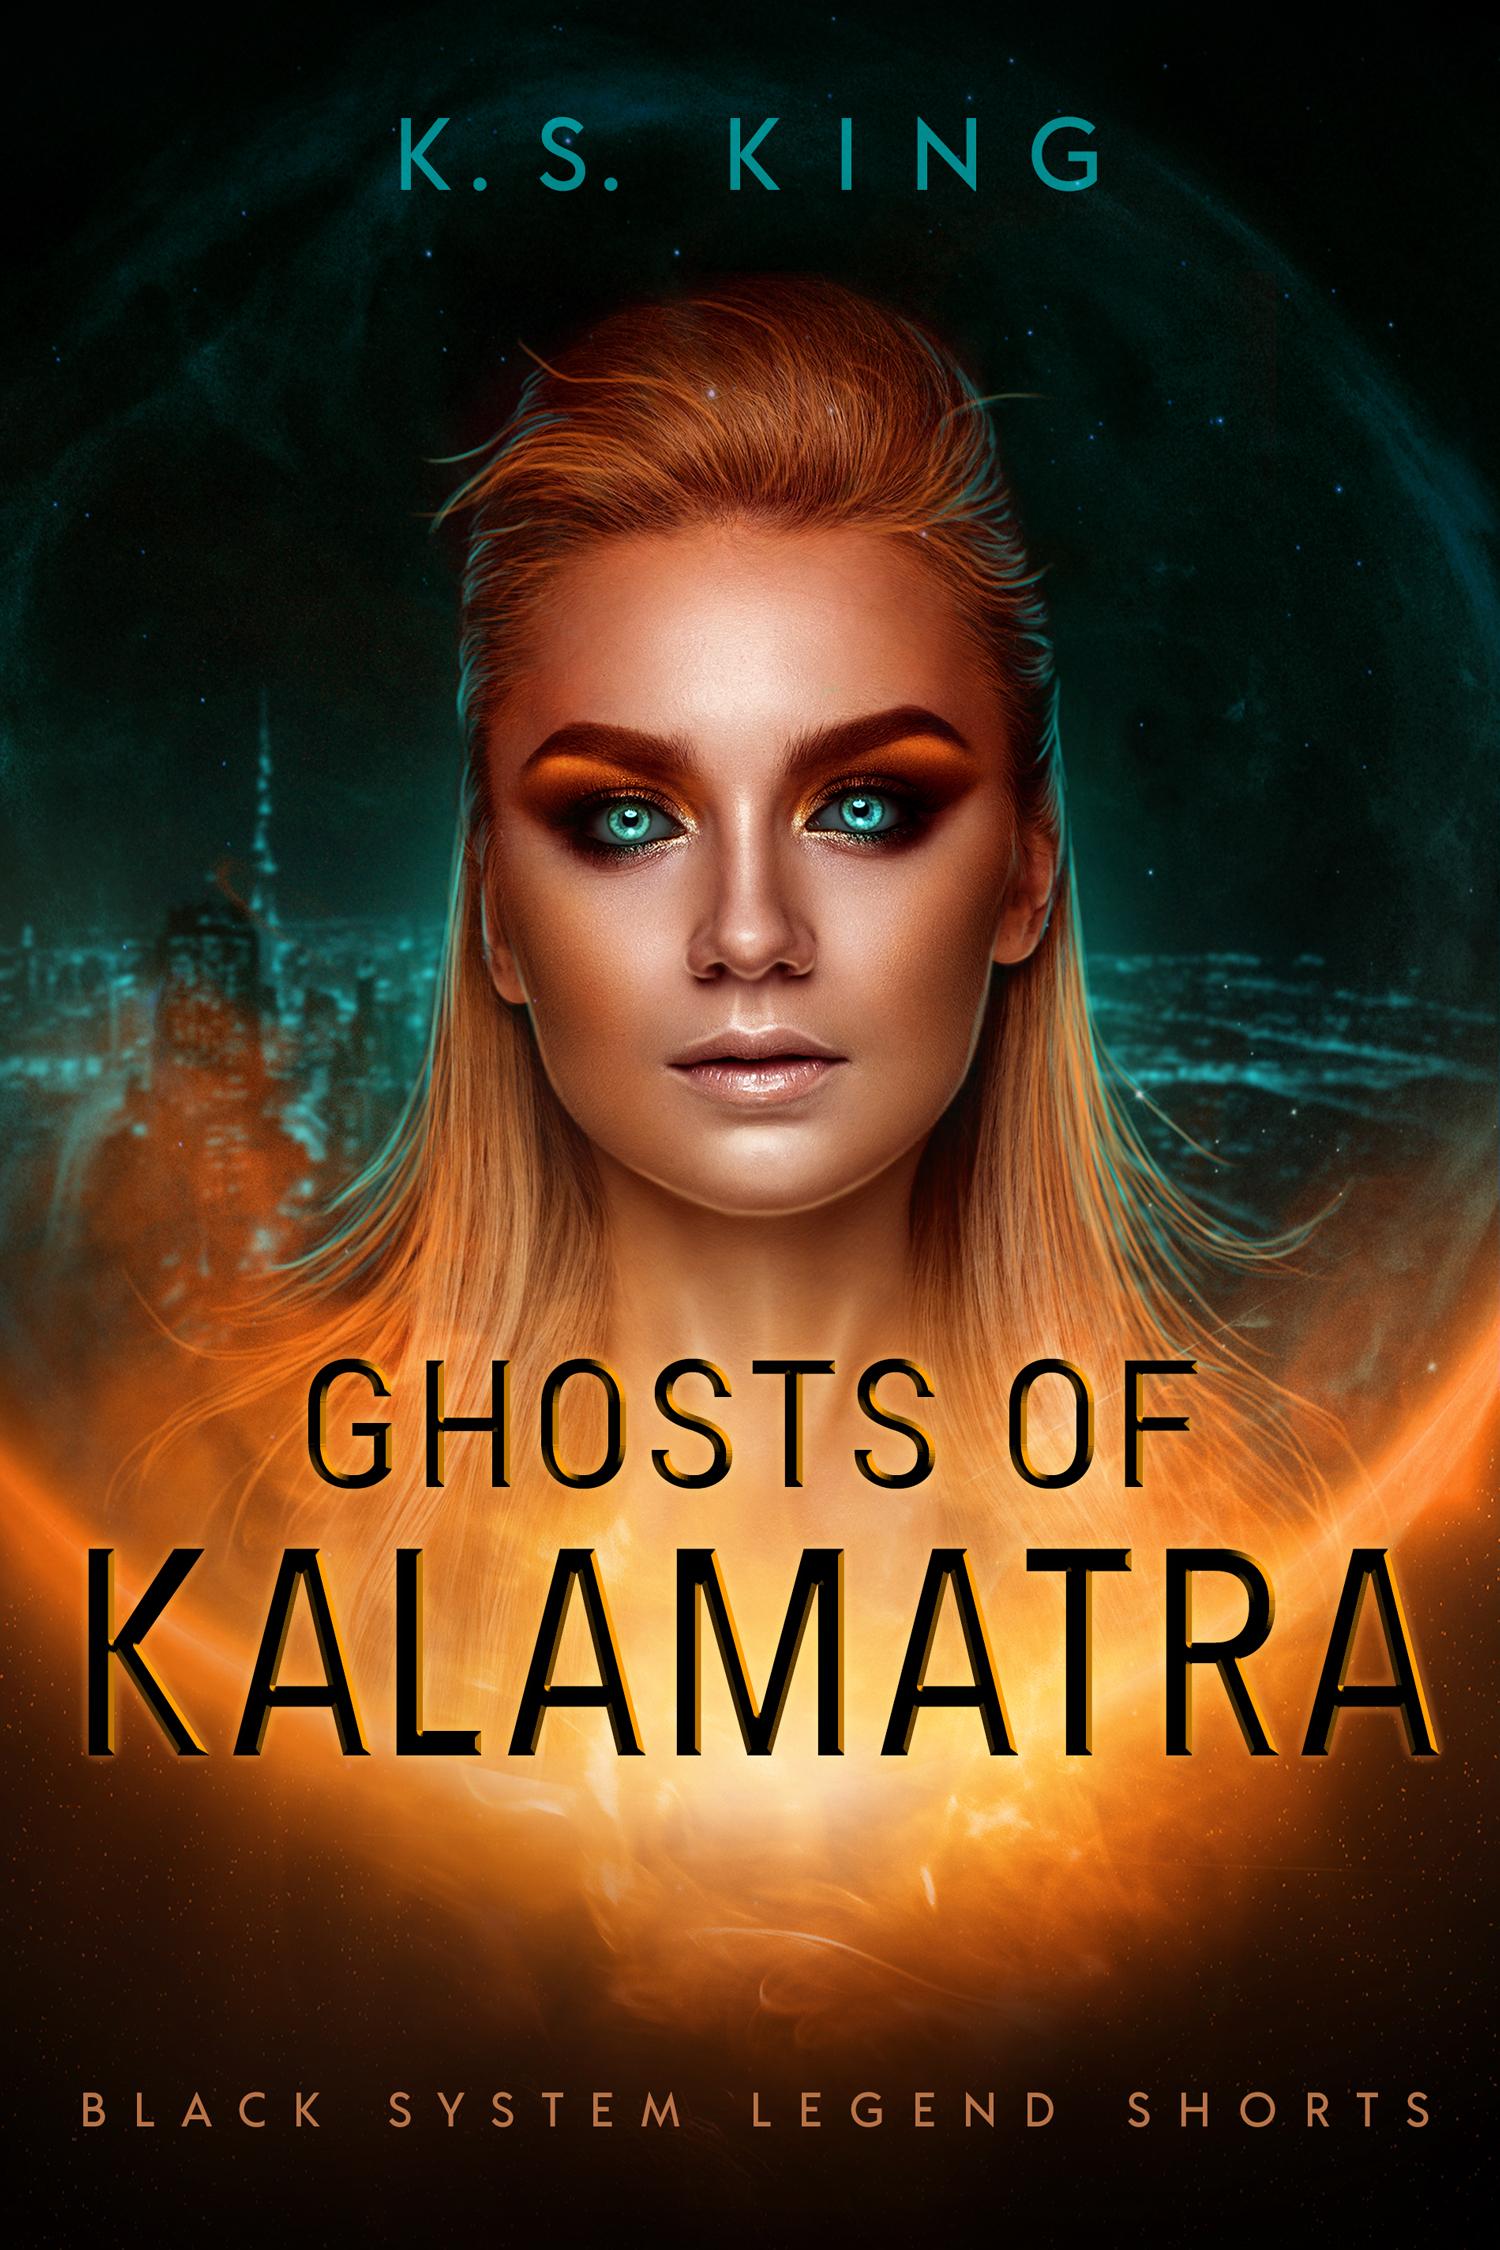 GhostsofKalamatra_LG.jpg